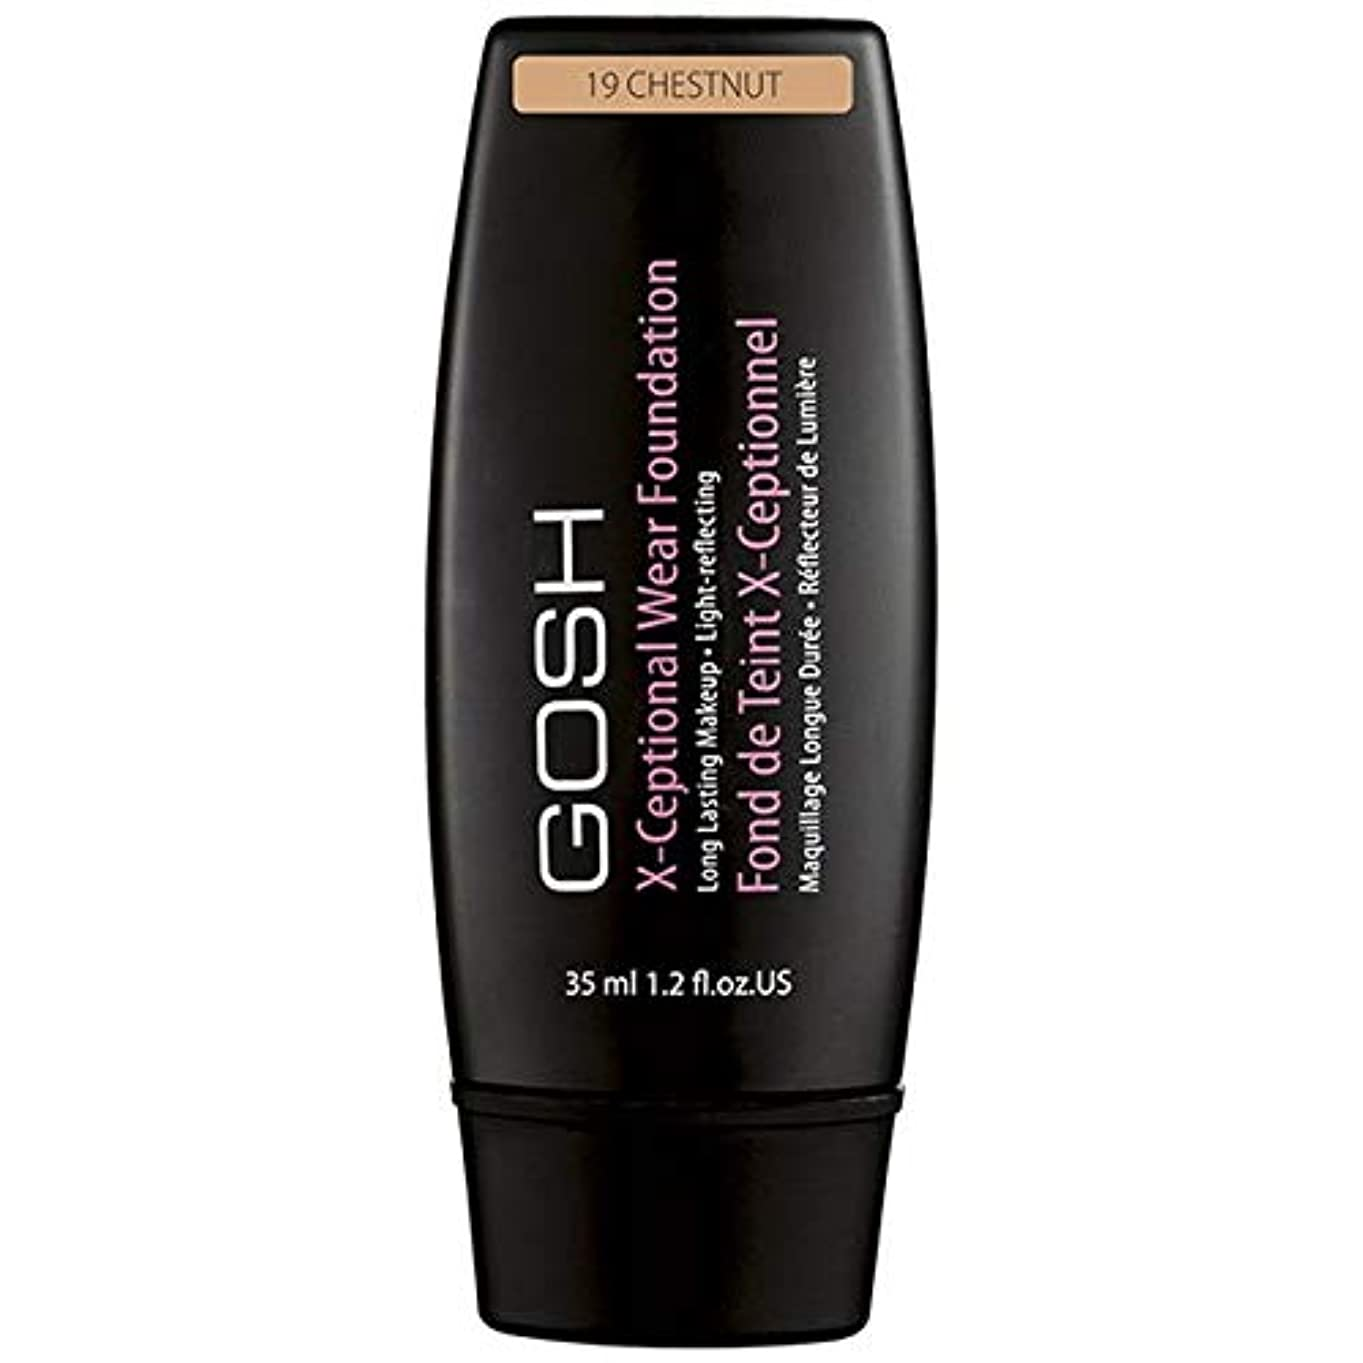 [GOSH ] おやっX-Ceptional摩耗は栗19を構成しています - Gosh X-Ceptional Wear Make Up Chestnut 19 [並行輸入品]